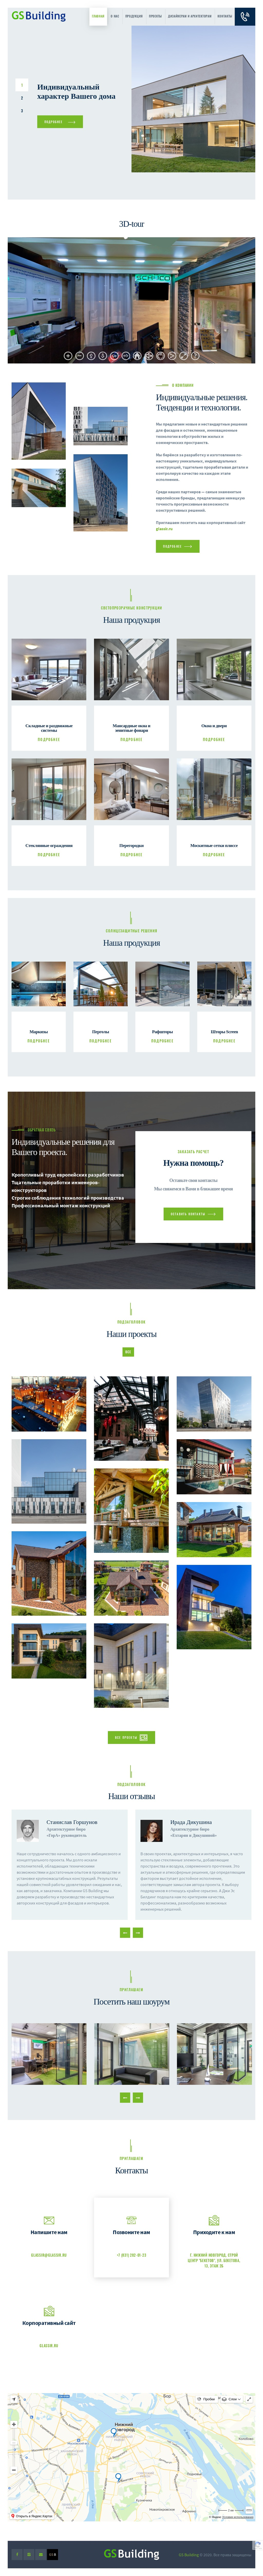 gsb-nn-ru-1024xFULLdesktop-ef585f